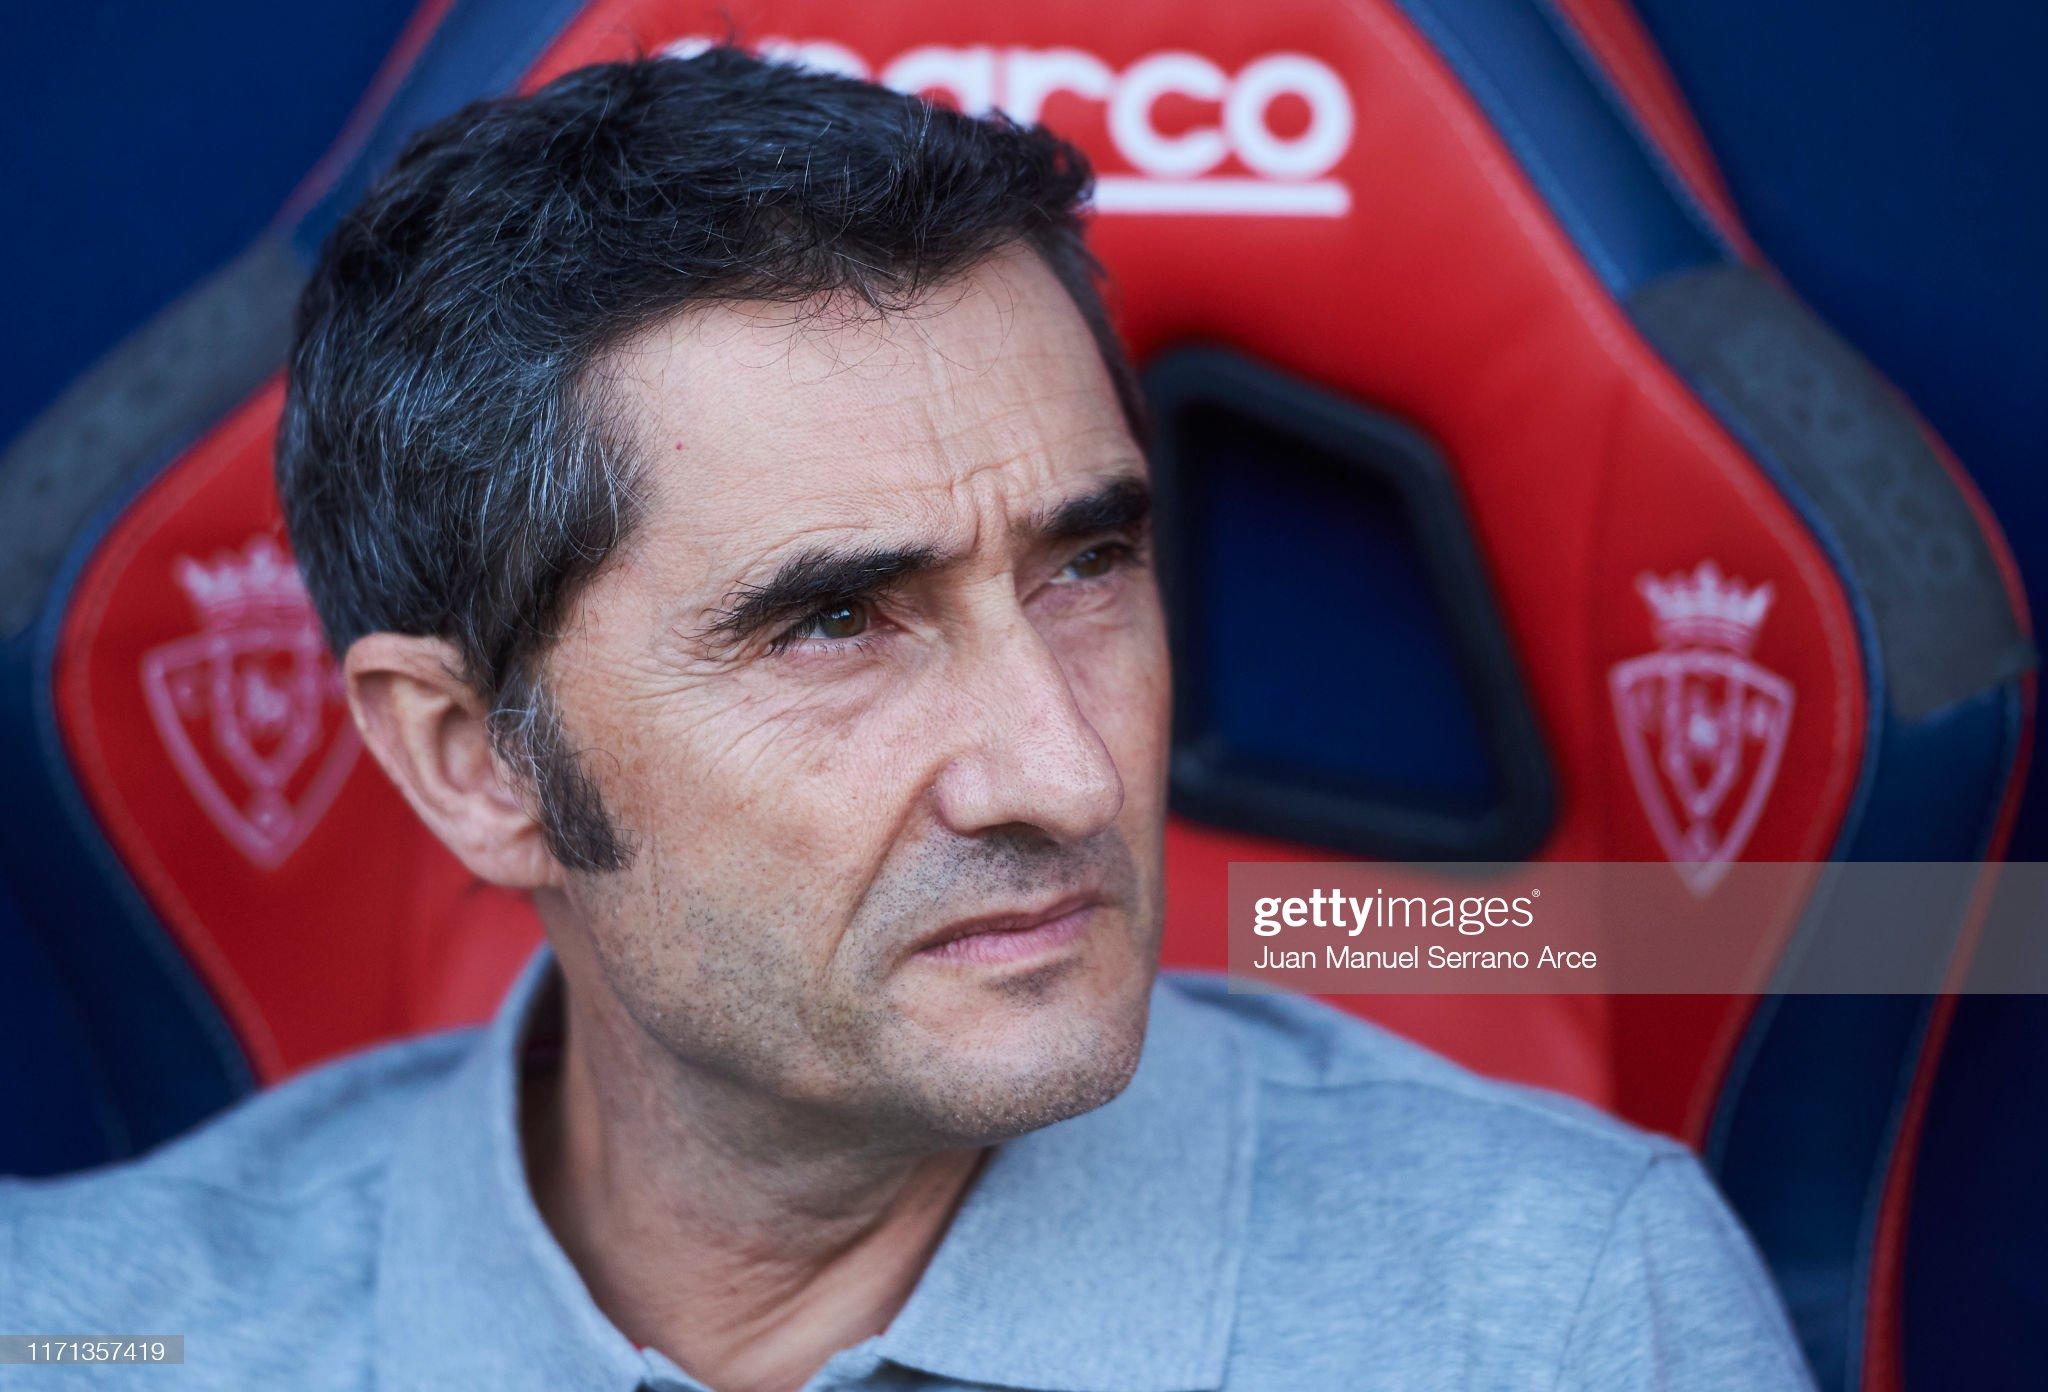 صور مباراة : أوساسونا - برشلونة 2-2 ( 31-08-2019 )  Head-coach-ernesto-valverde-of-fc-barcelona-looks-on-prior-to-the-picture-id1171357419?s=2048x2048